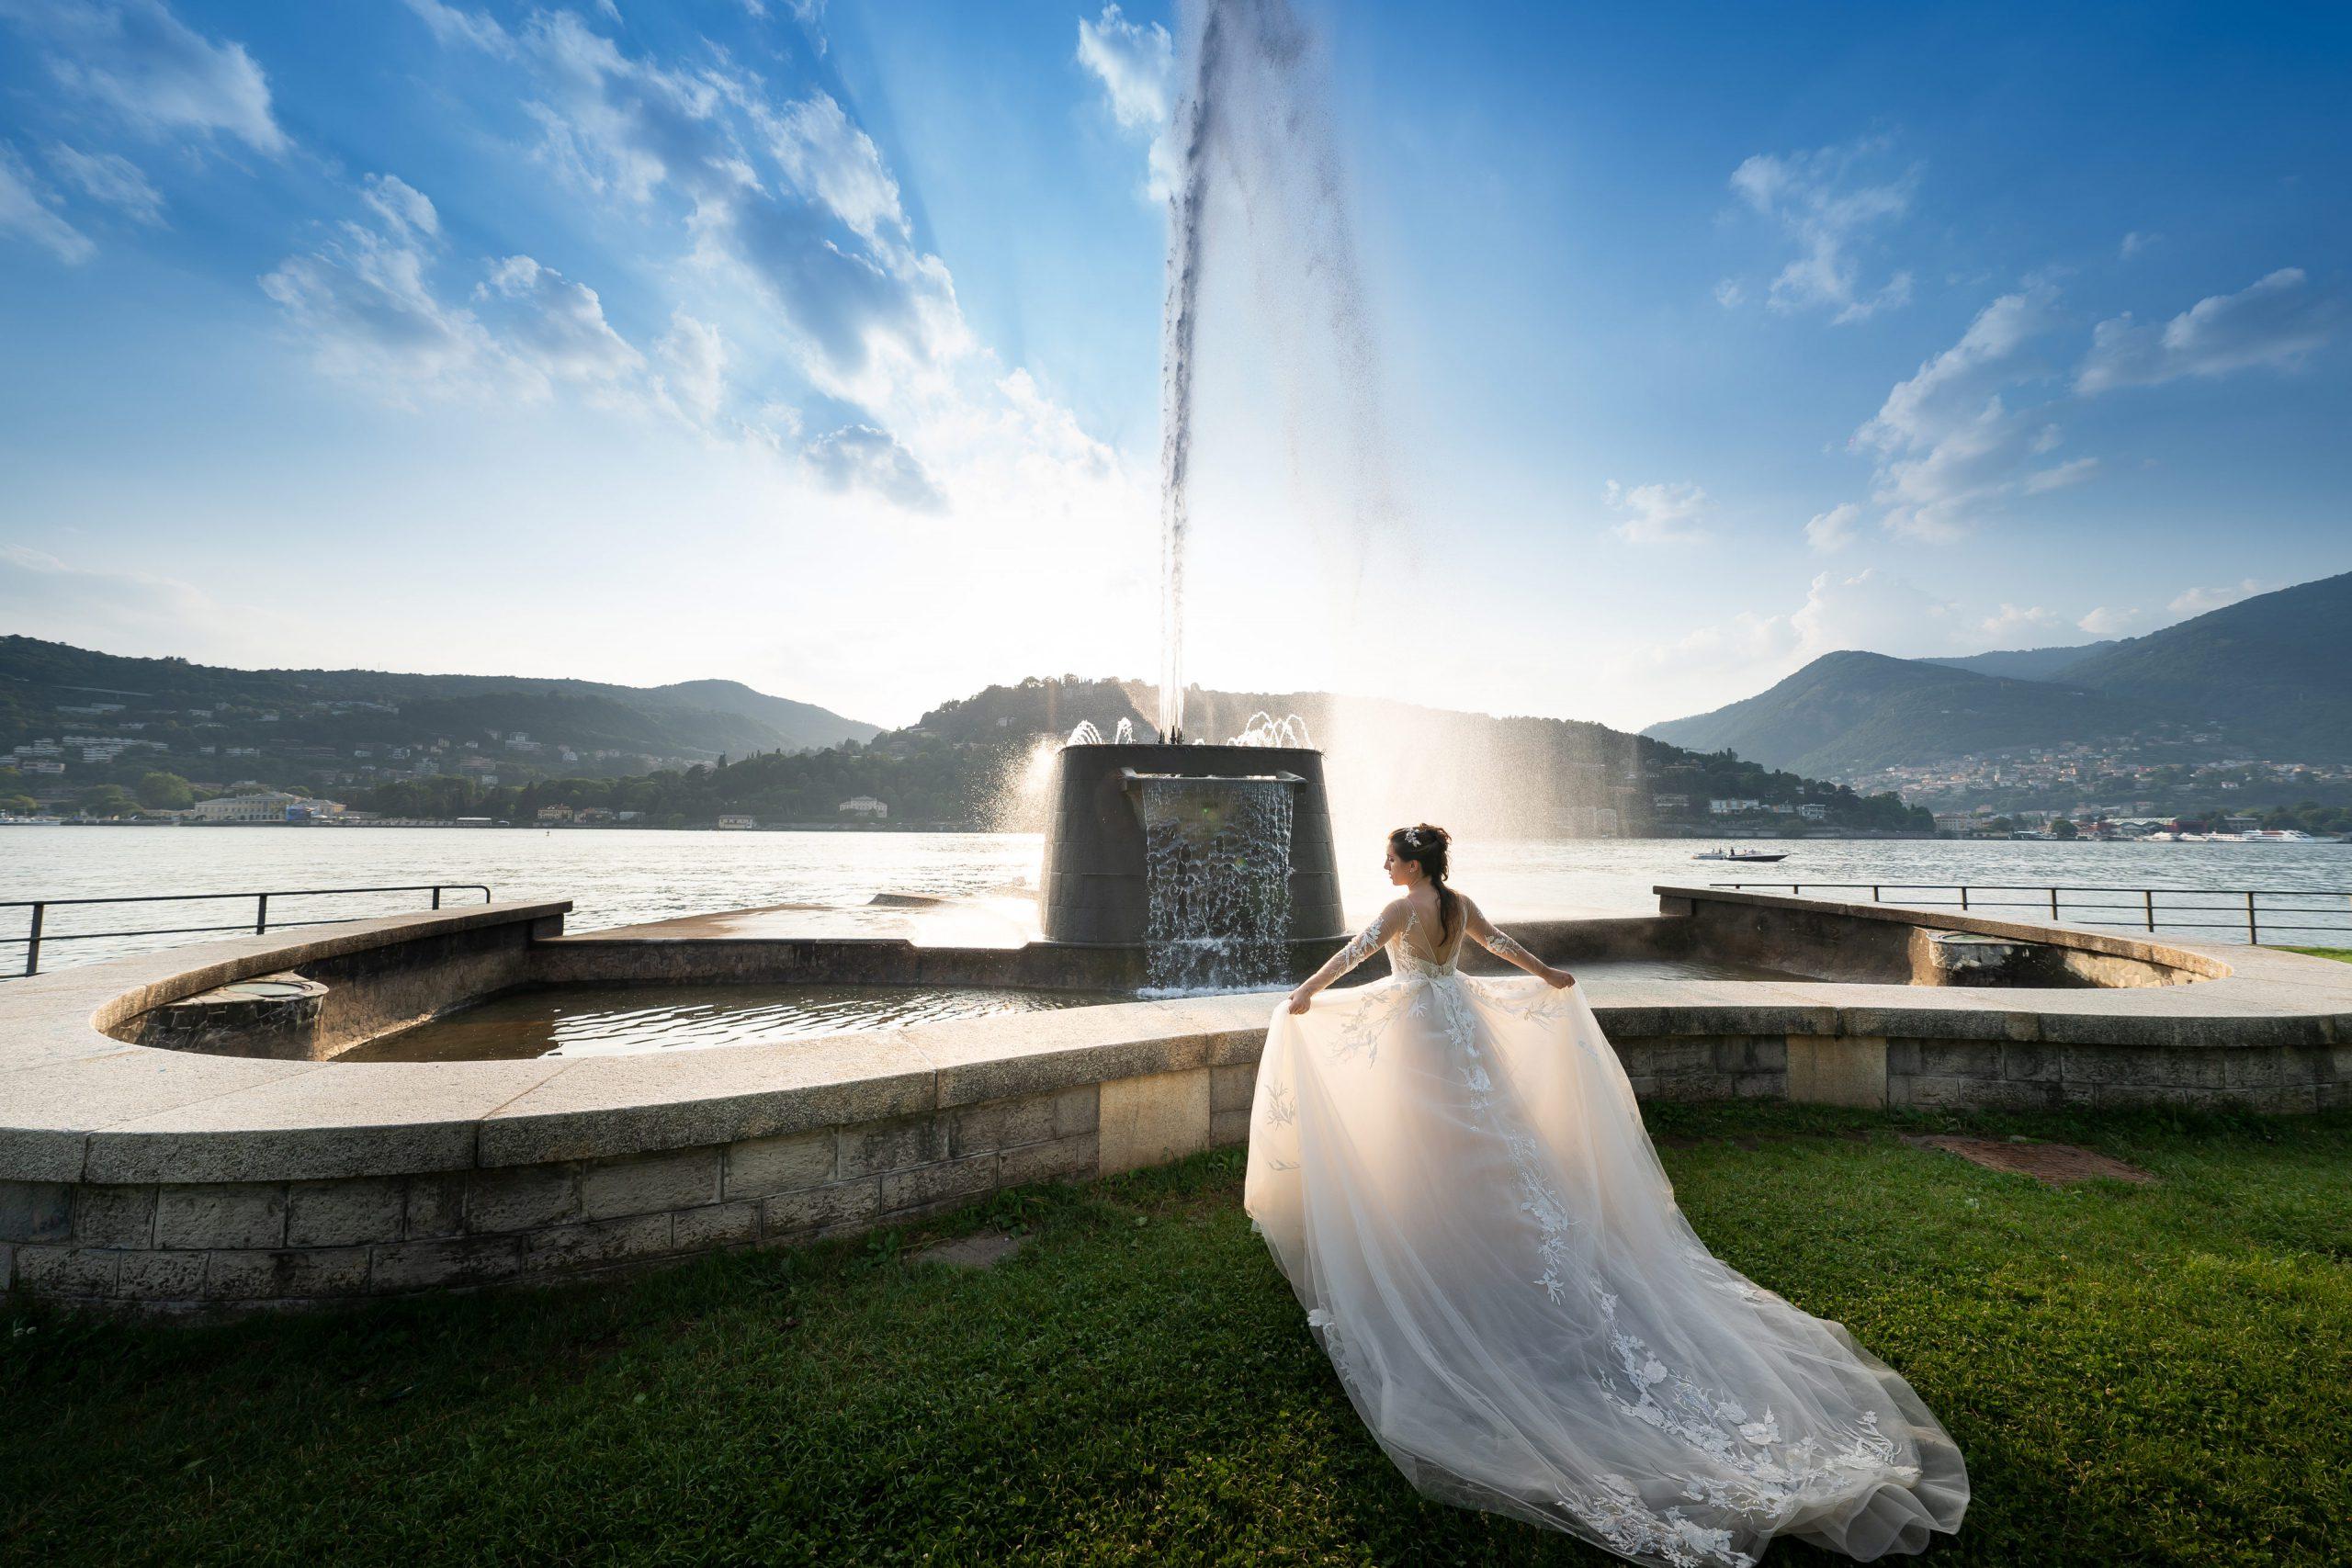 045 fotografo matrimonio reportage wedding sposi ritratti lago fontana villa geno como 2